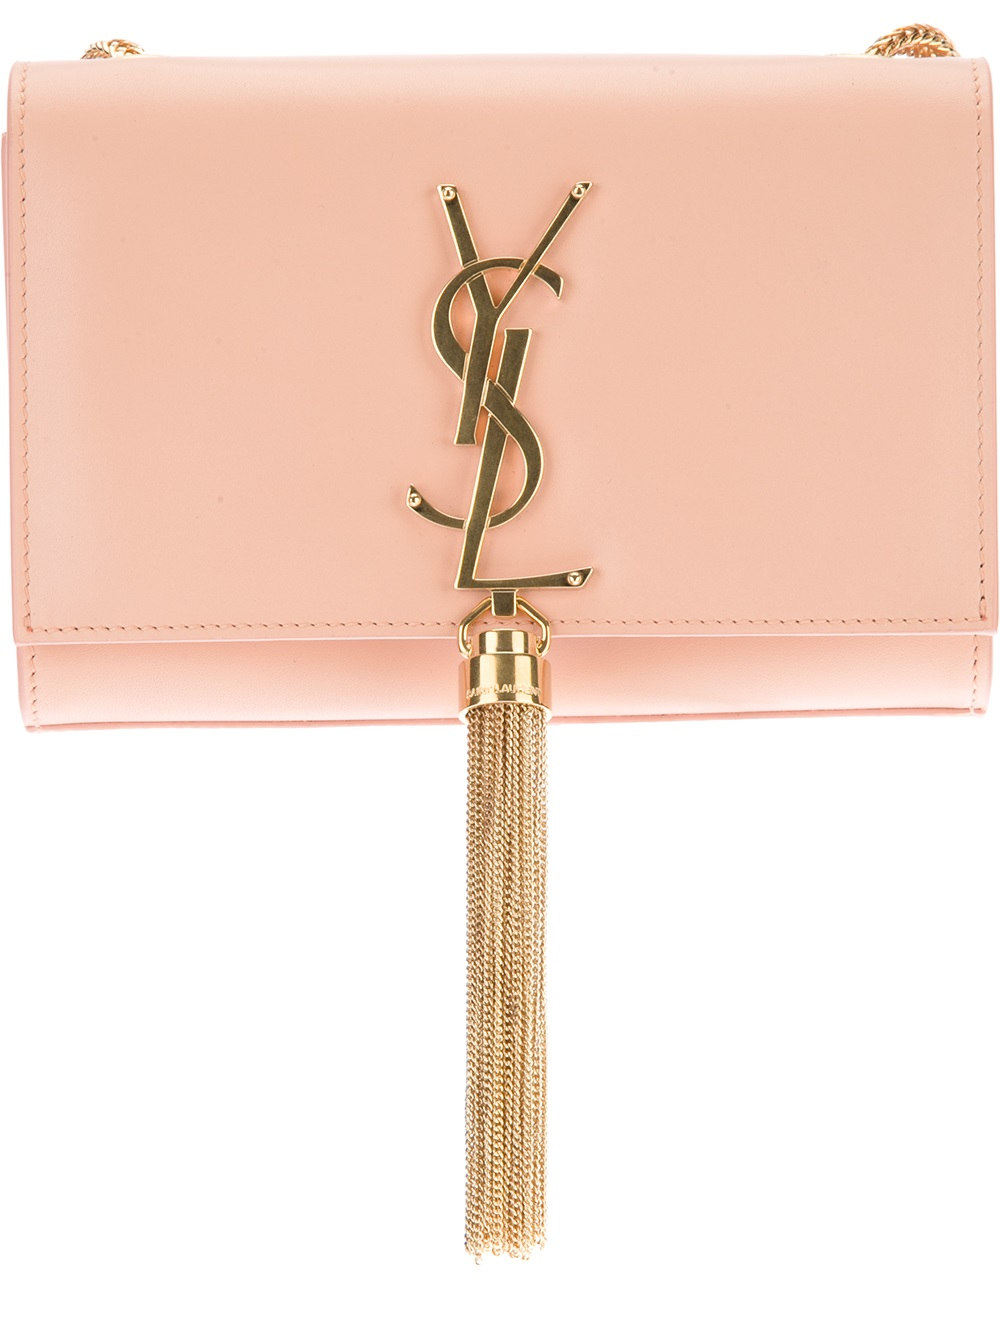 Lyst - Saint Laurent Small Cassandre Tassel Shoulder Bag in Pink 066773f79e703